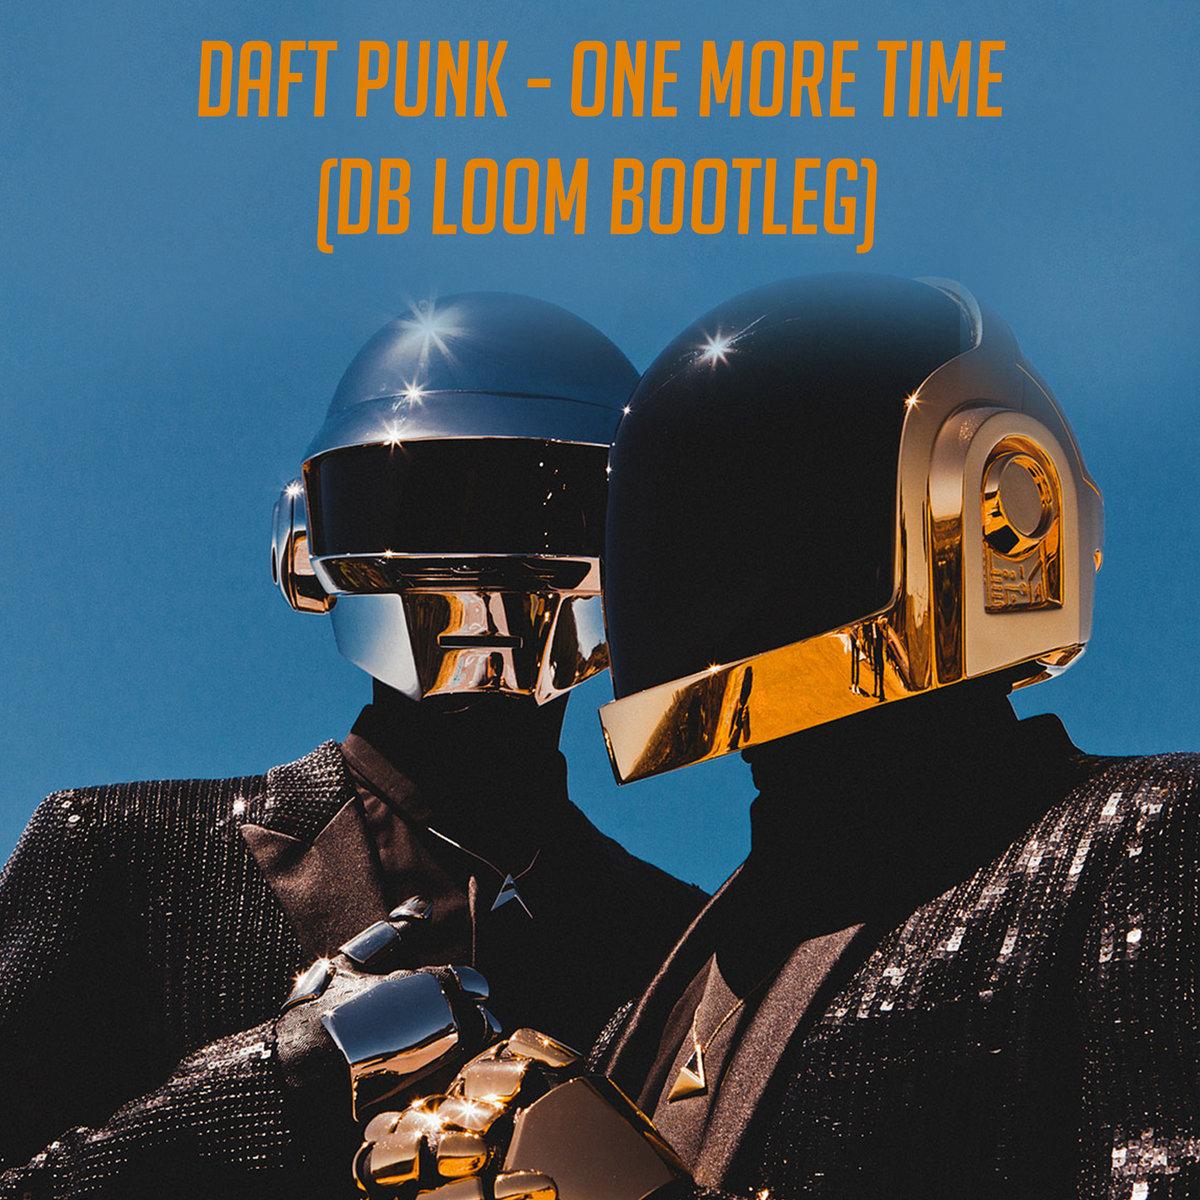 Daft punk – one more time (hotblood remix).